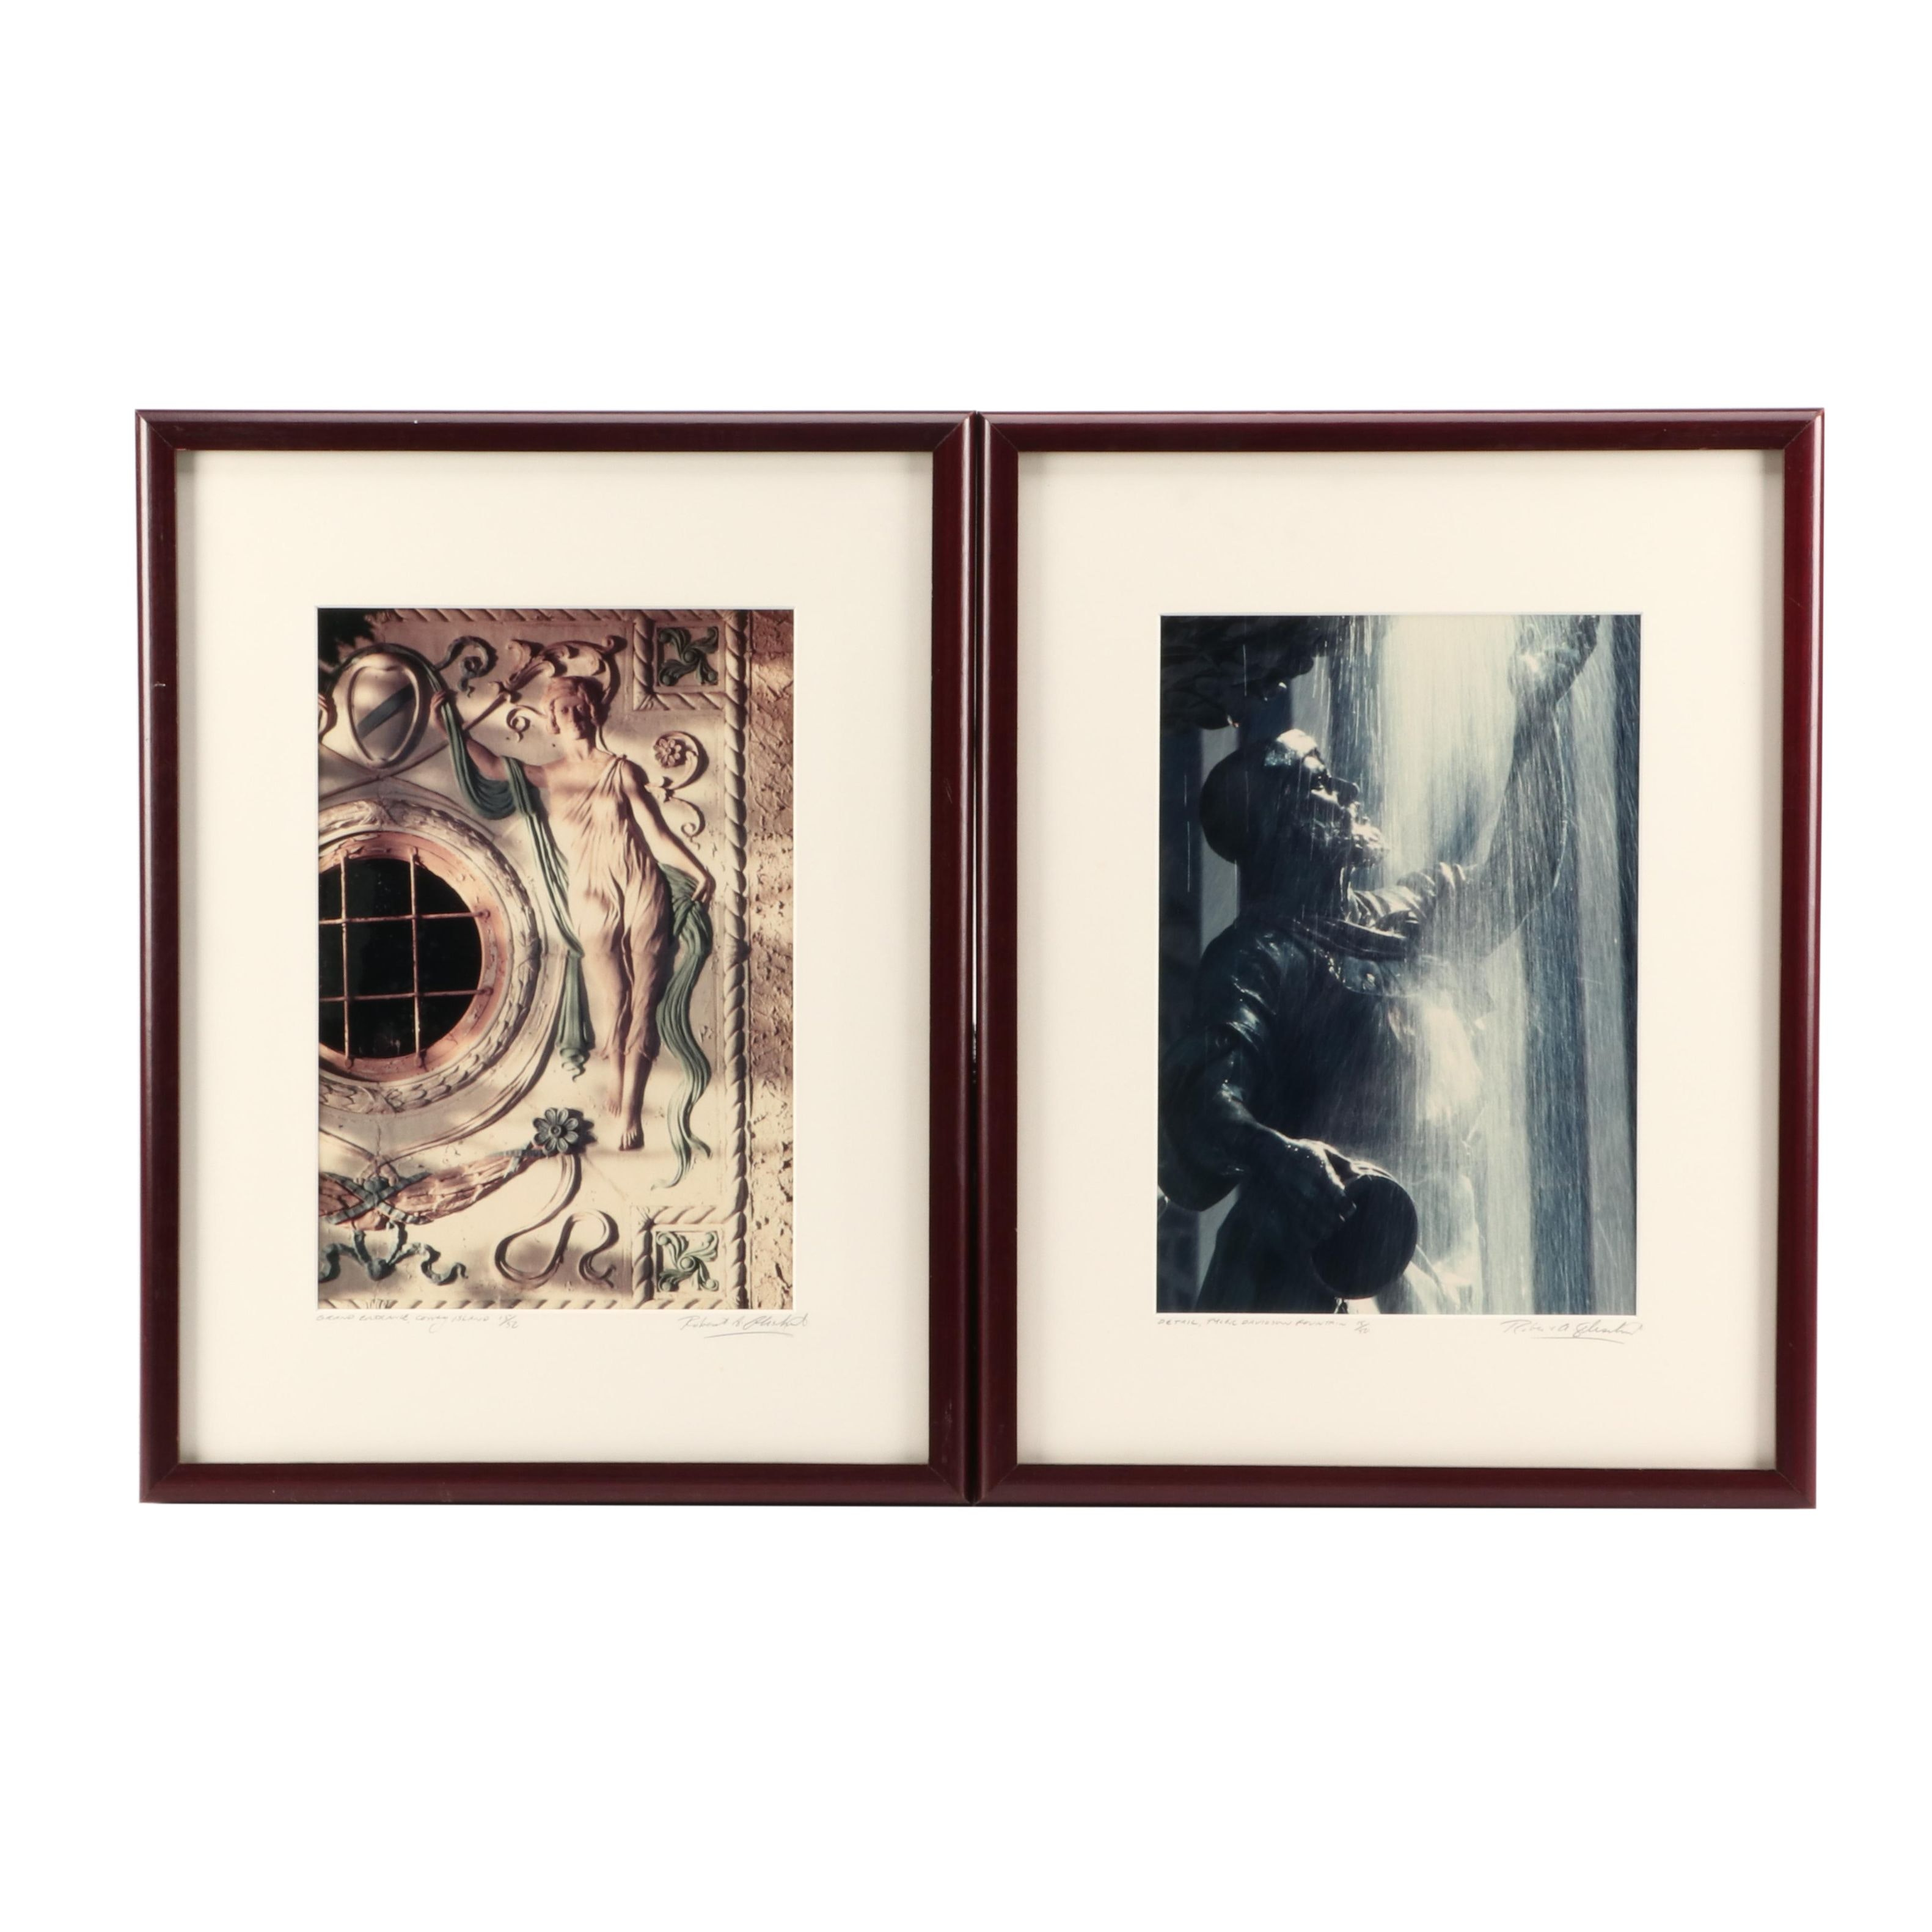 Robert Flischel Limited Edition Photographs of Cincinnati Landmarks